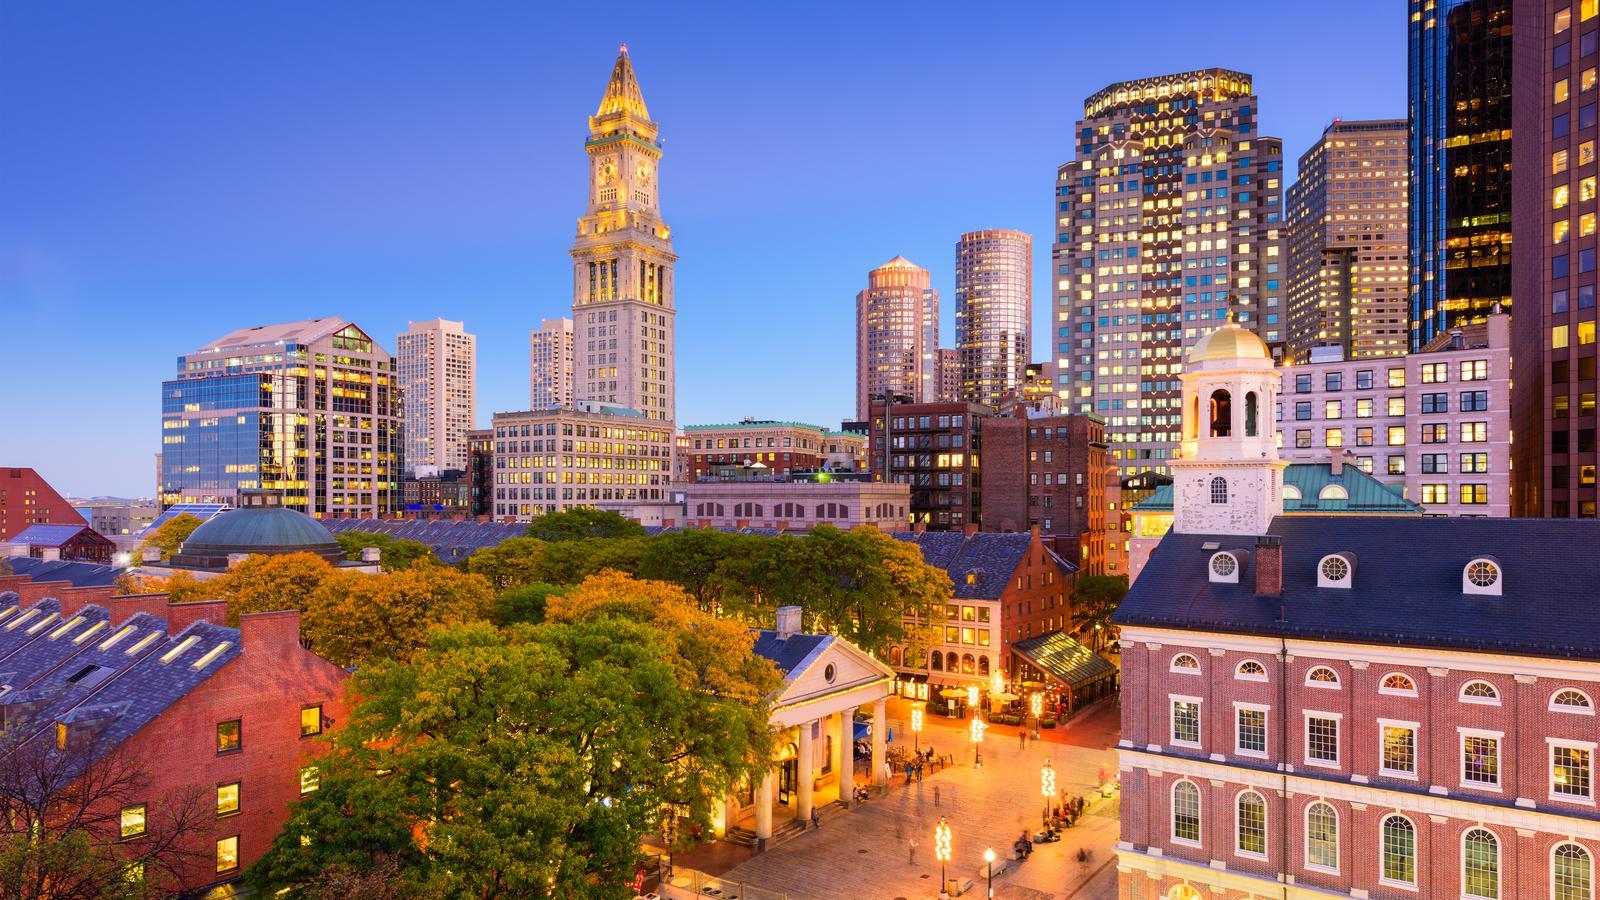 Downtown of Boston, MA